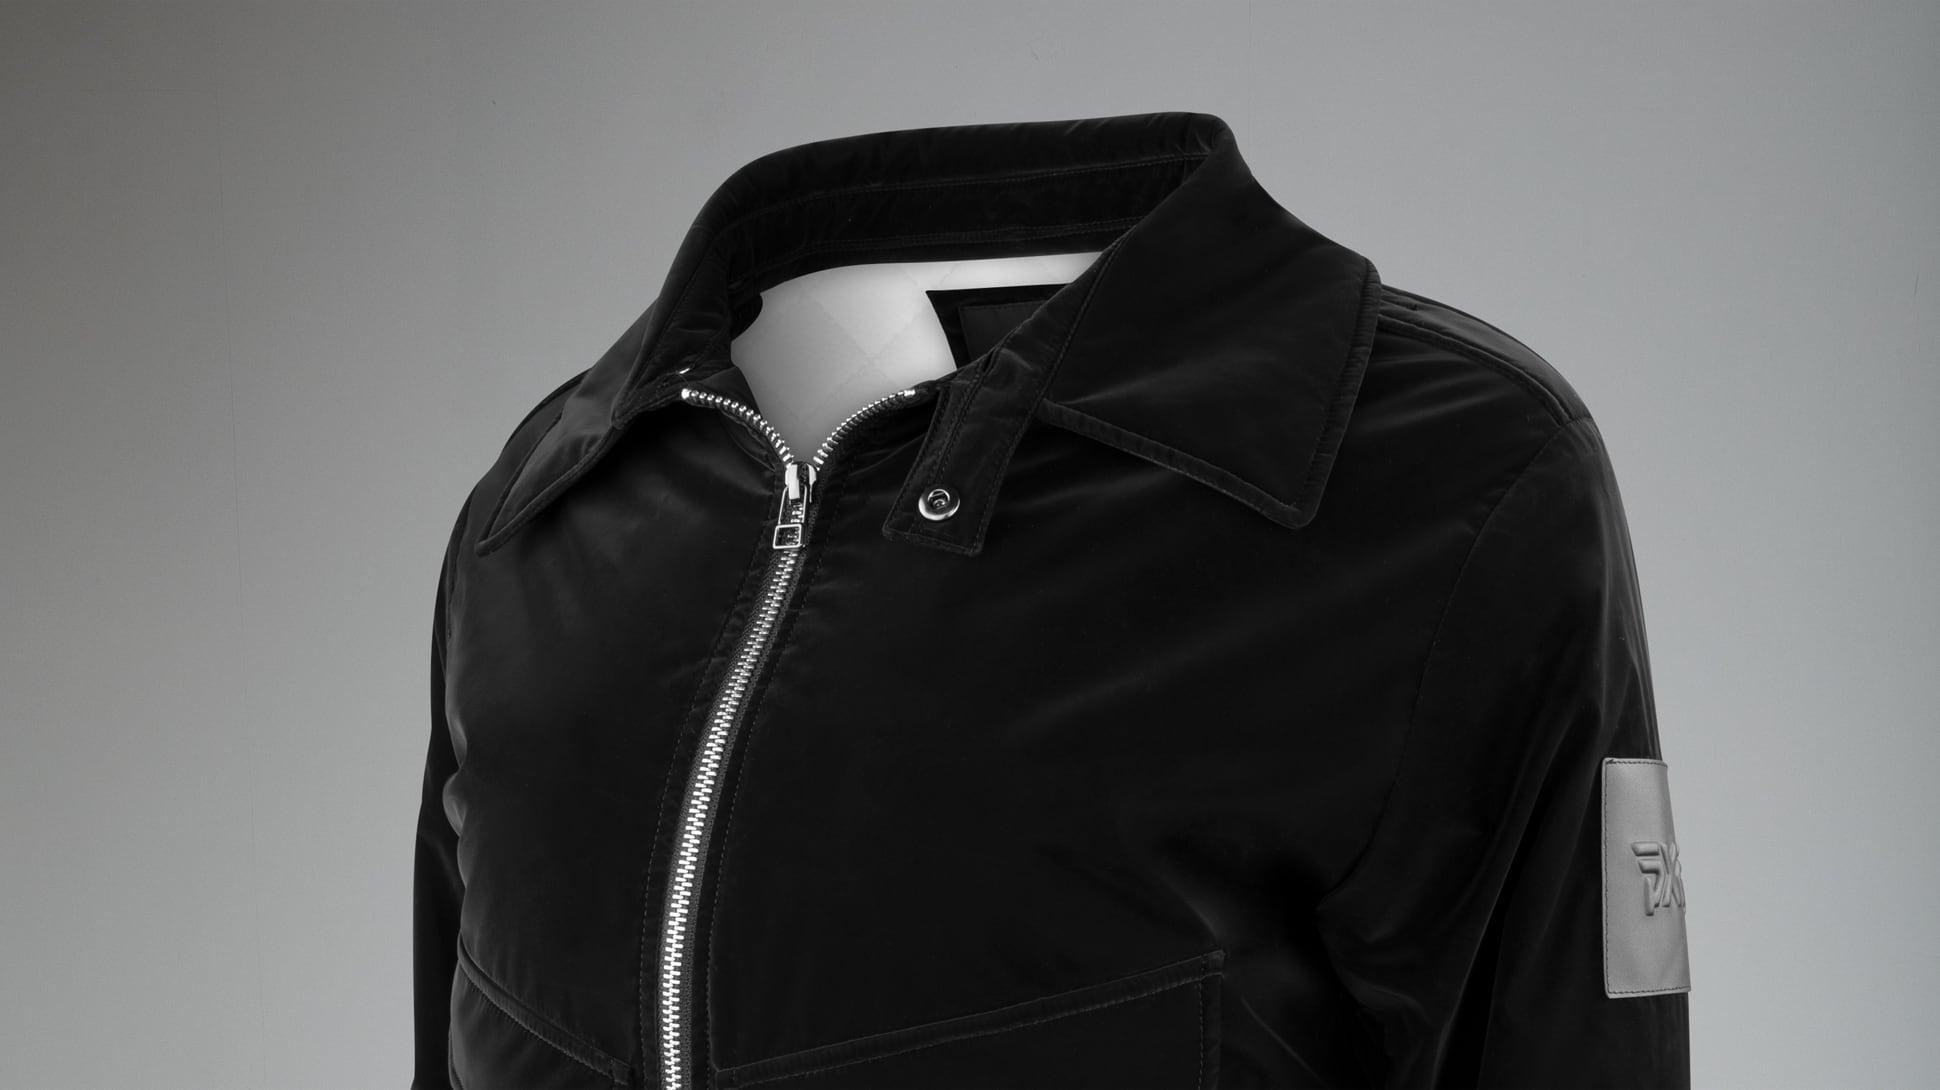 Winter-Ready Wool Bomber Jacket Image 3